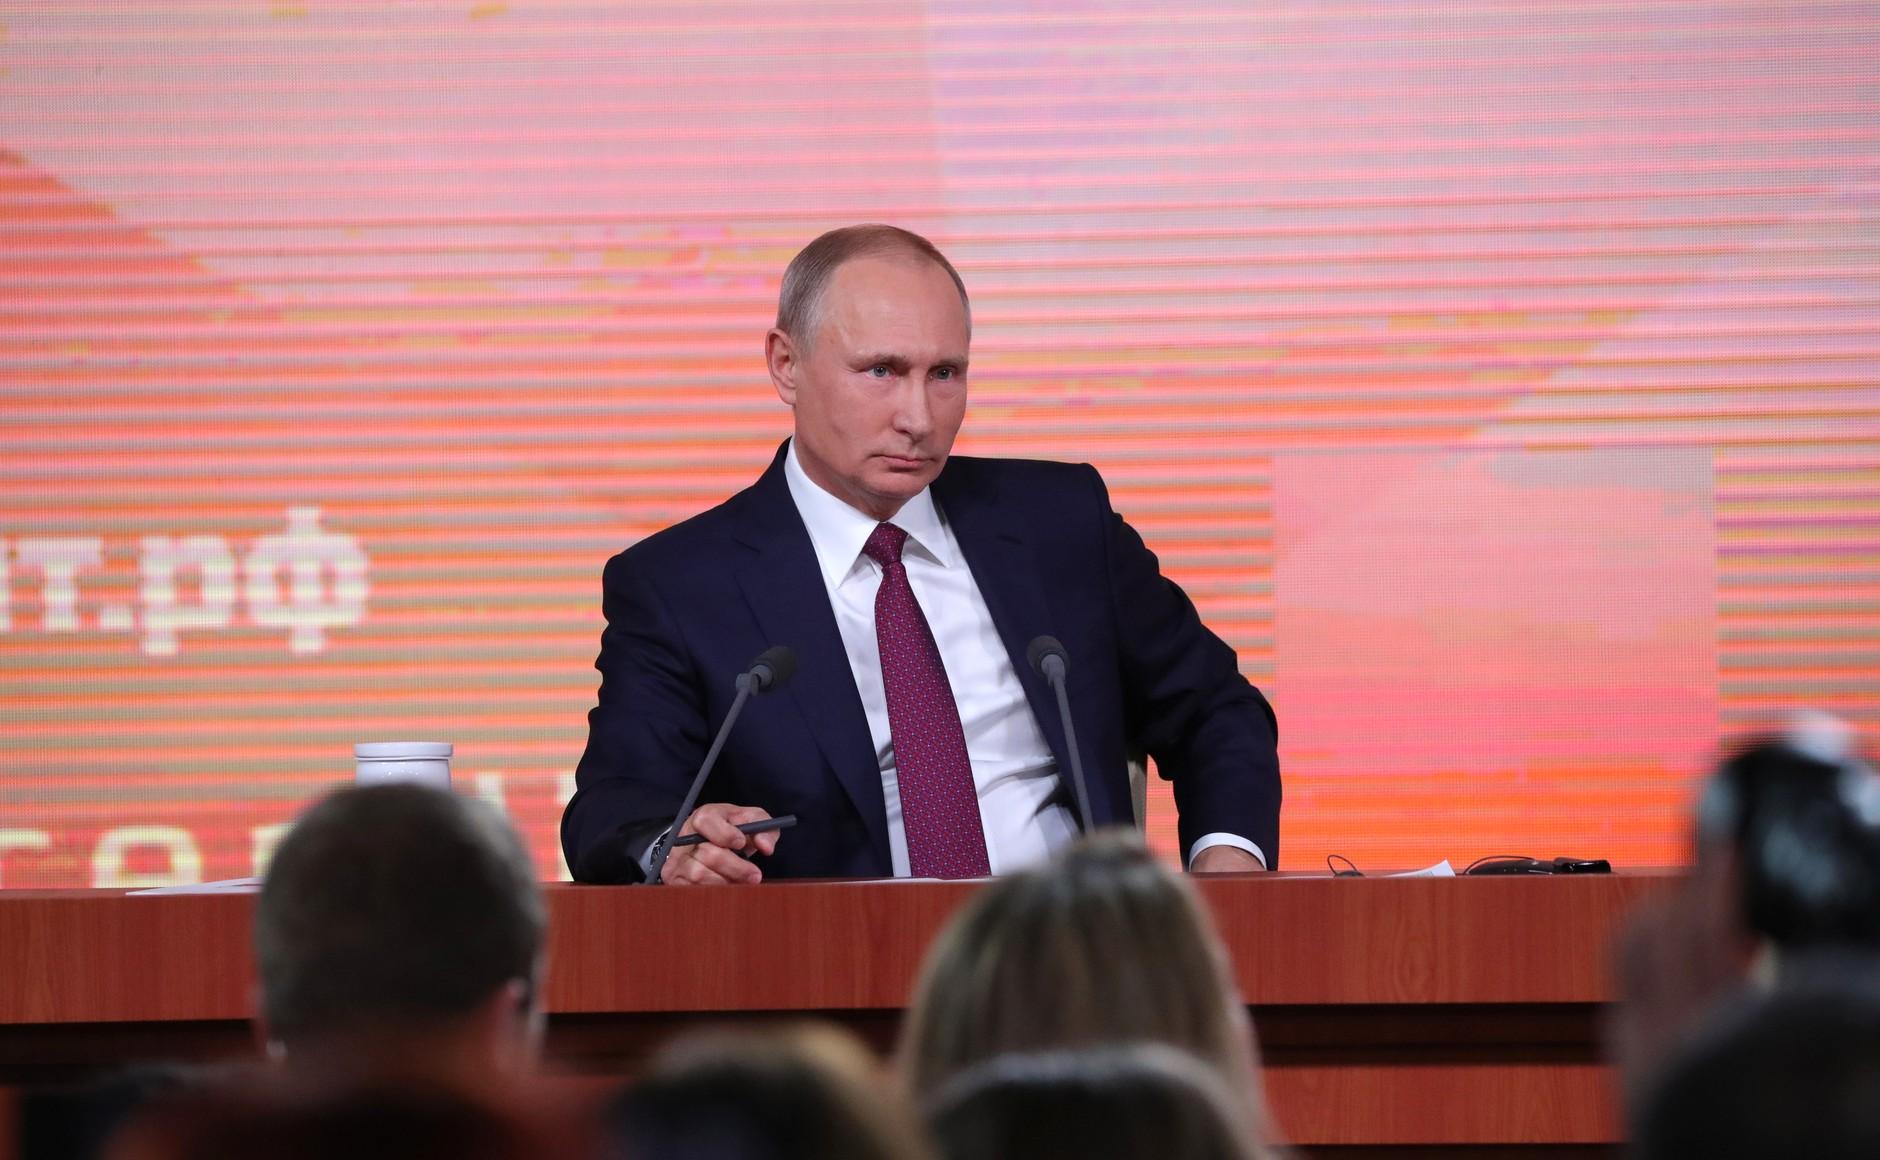 Putin will show: One-day photo tour to Ryazan